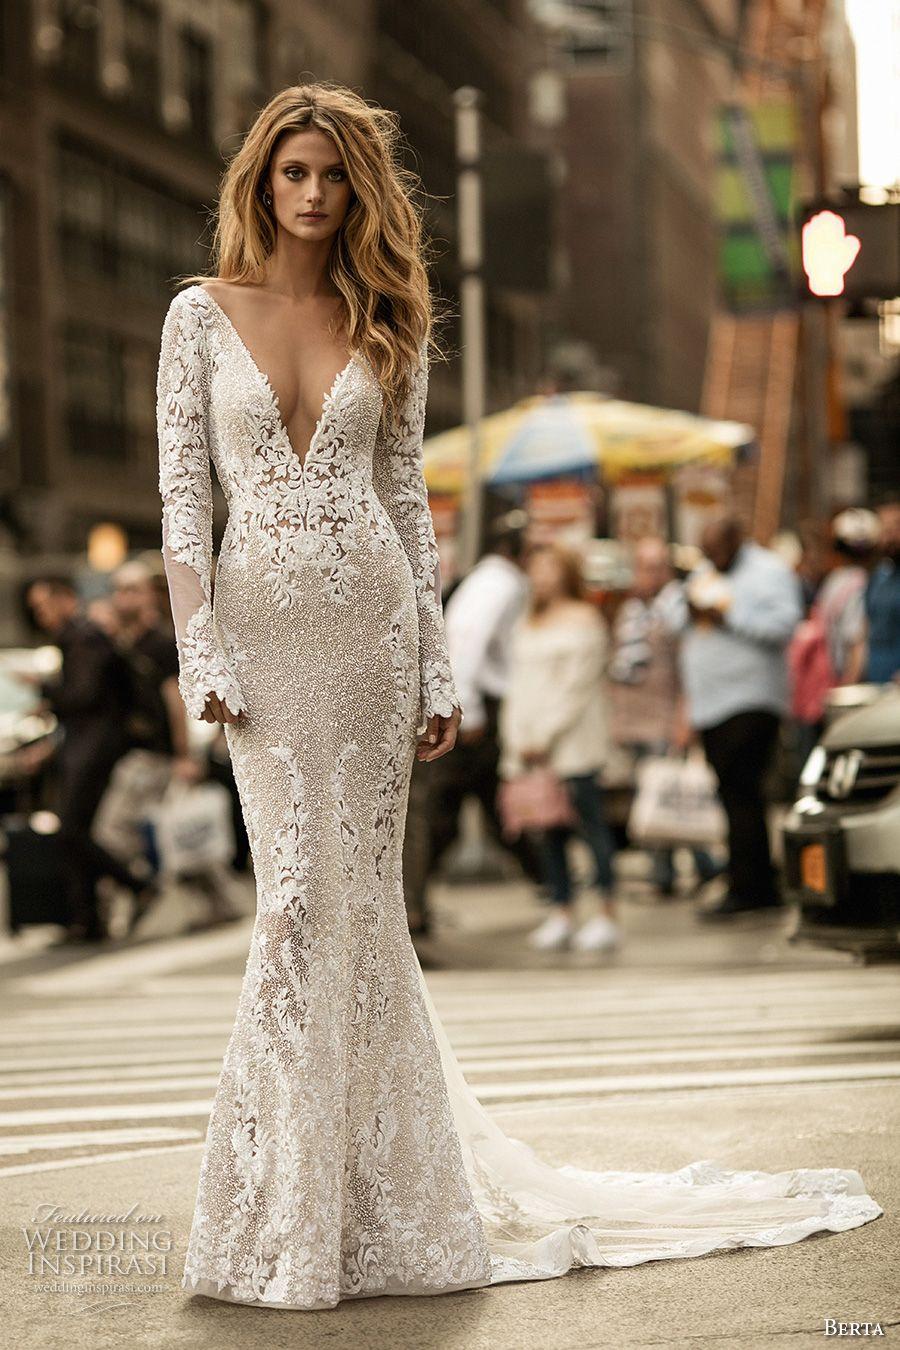 Berta fall wedding dresses chapel train wedding dress and